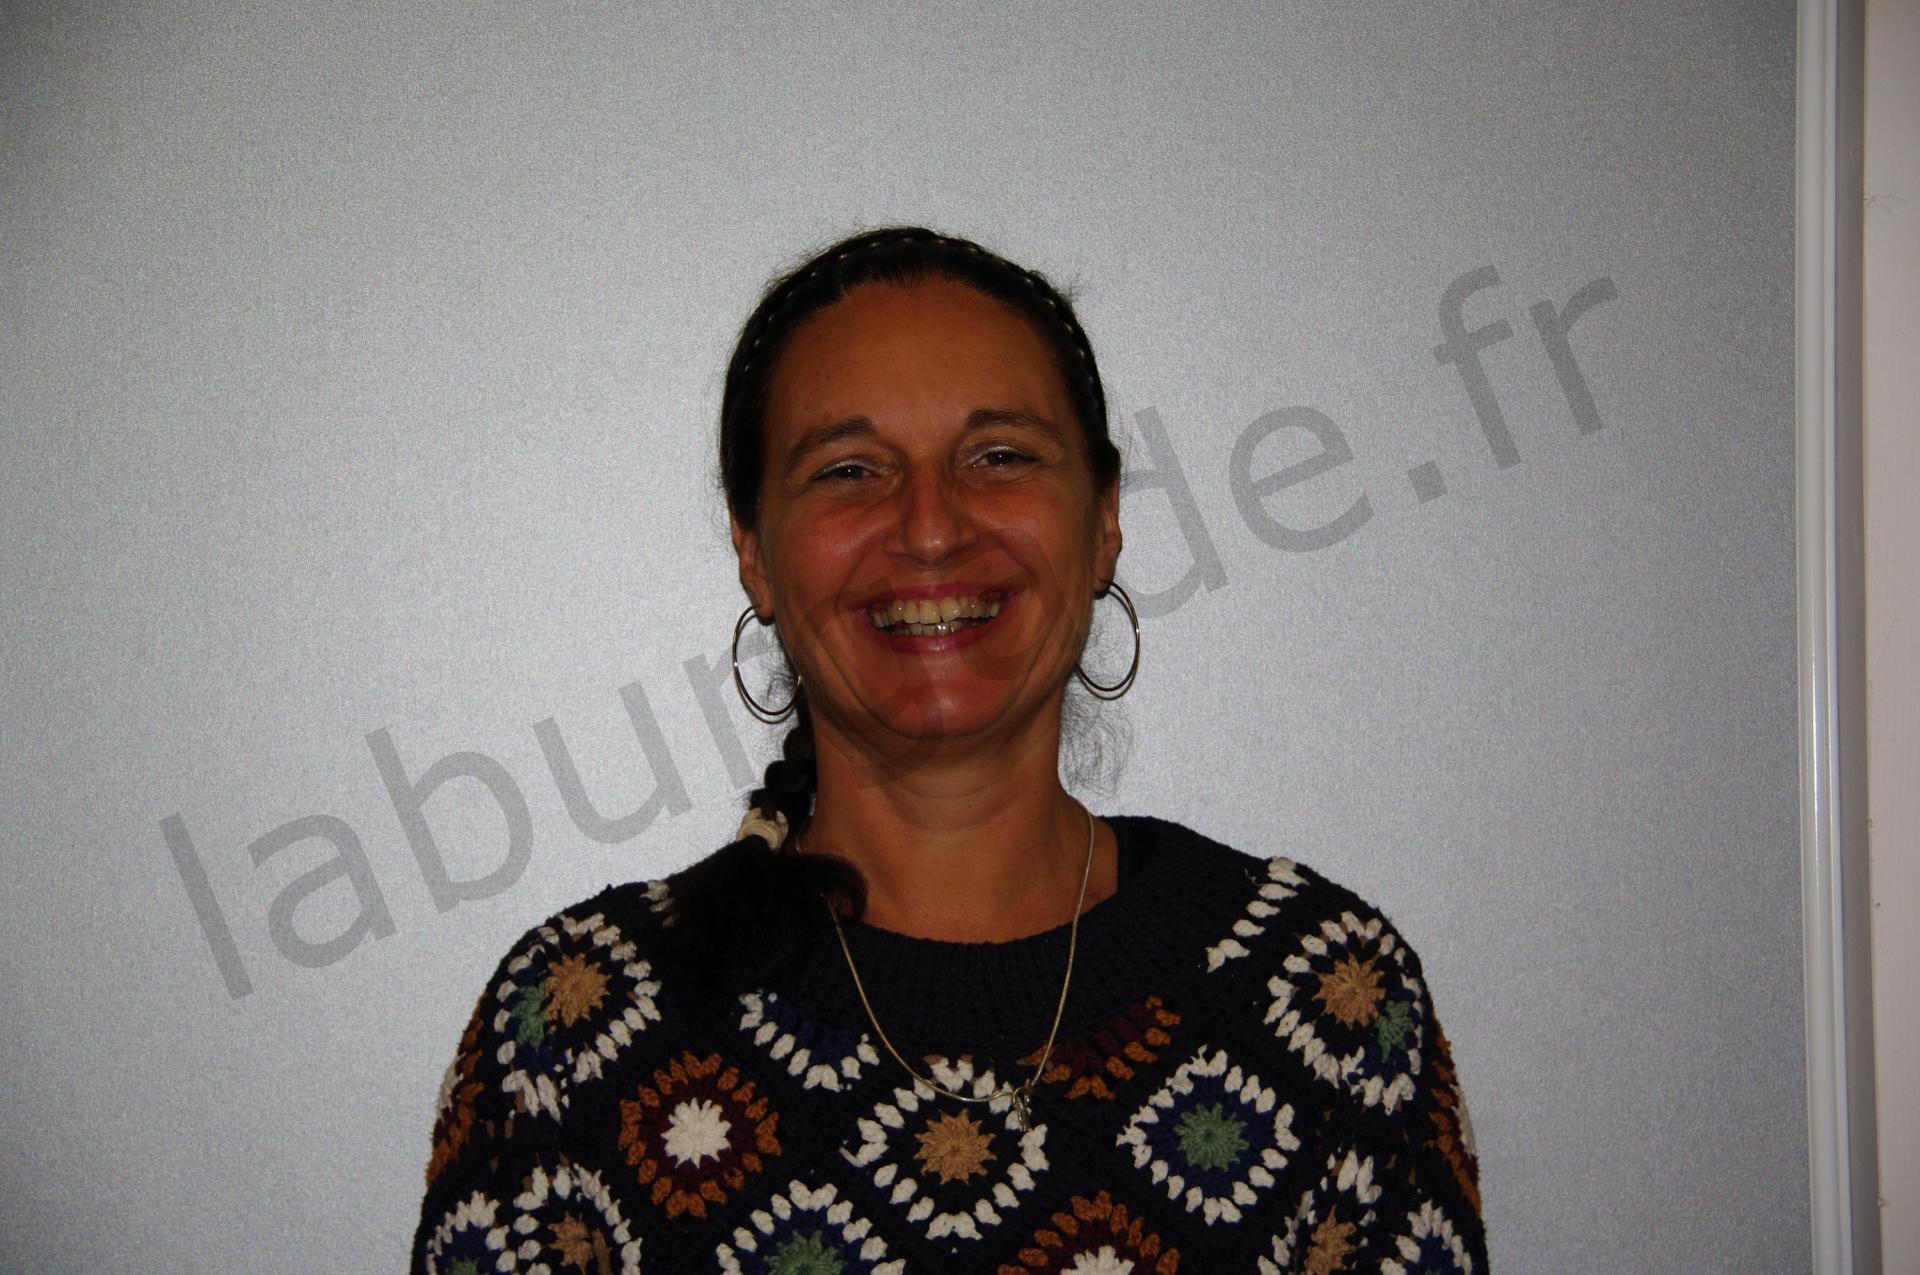 Sabine barboni ghazi laburgade